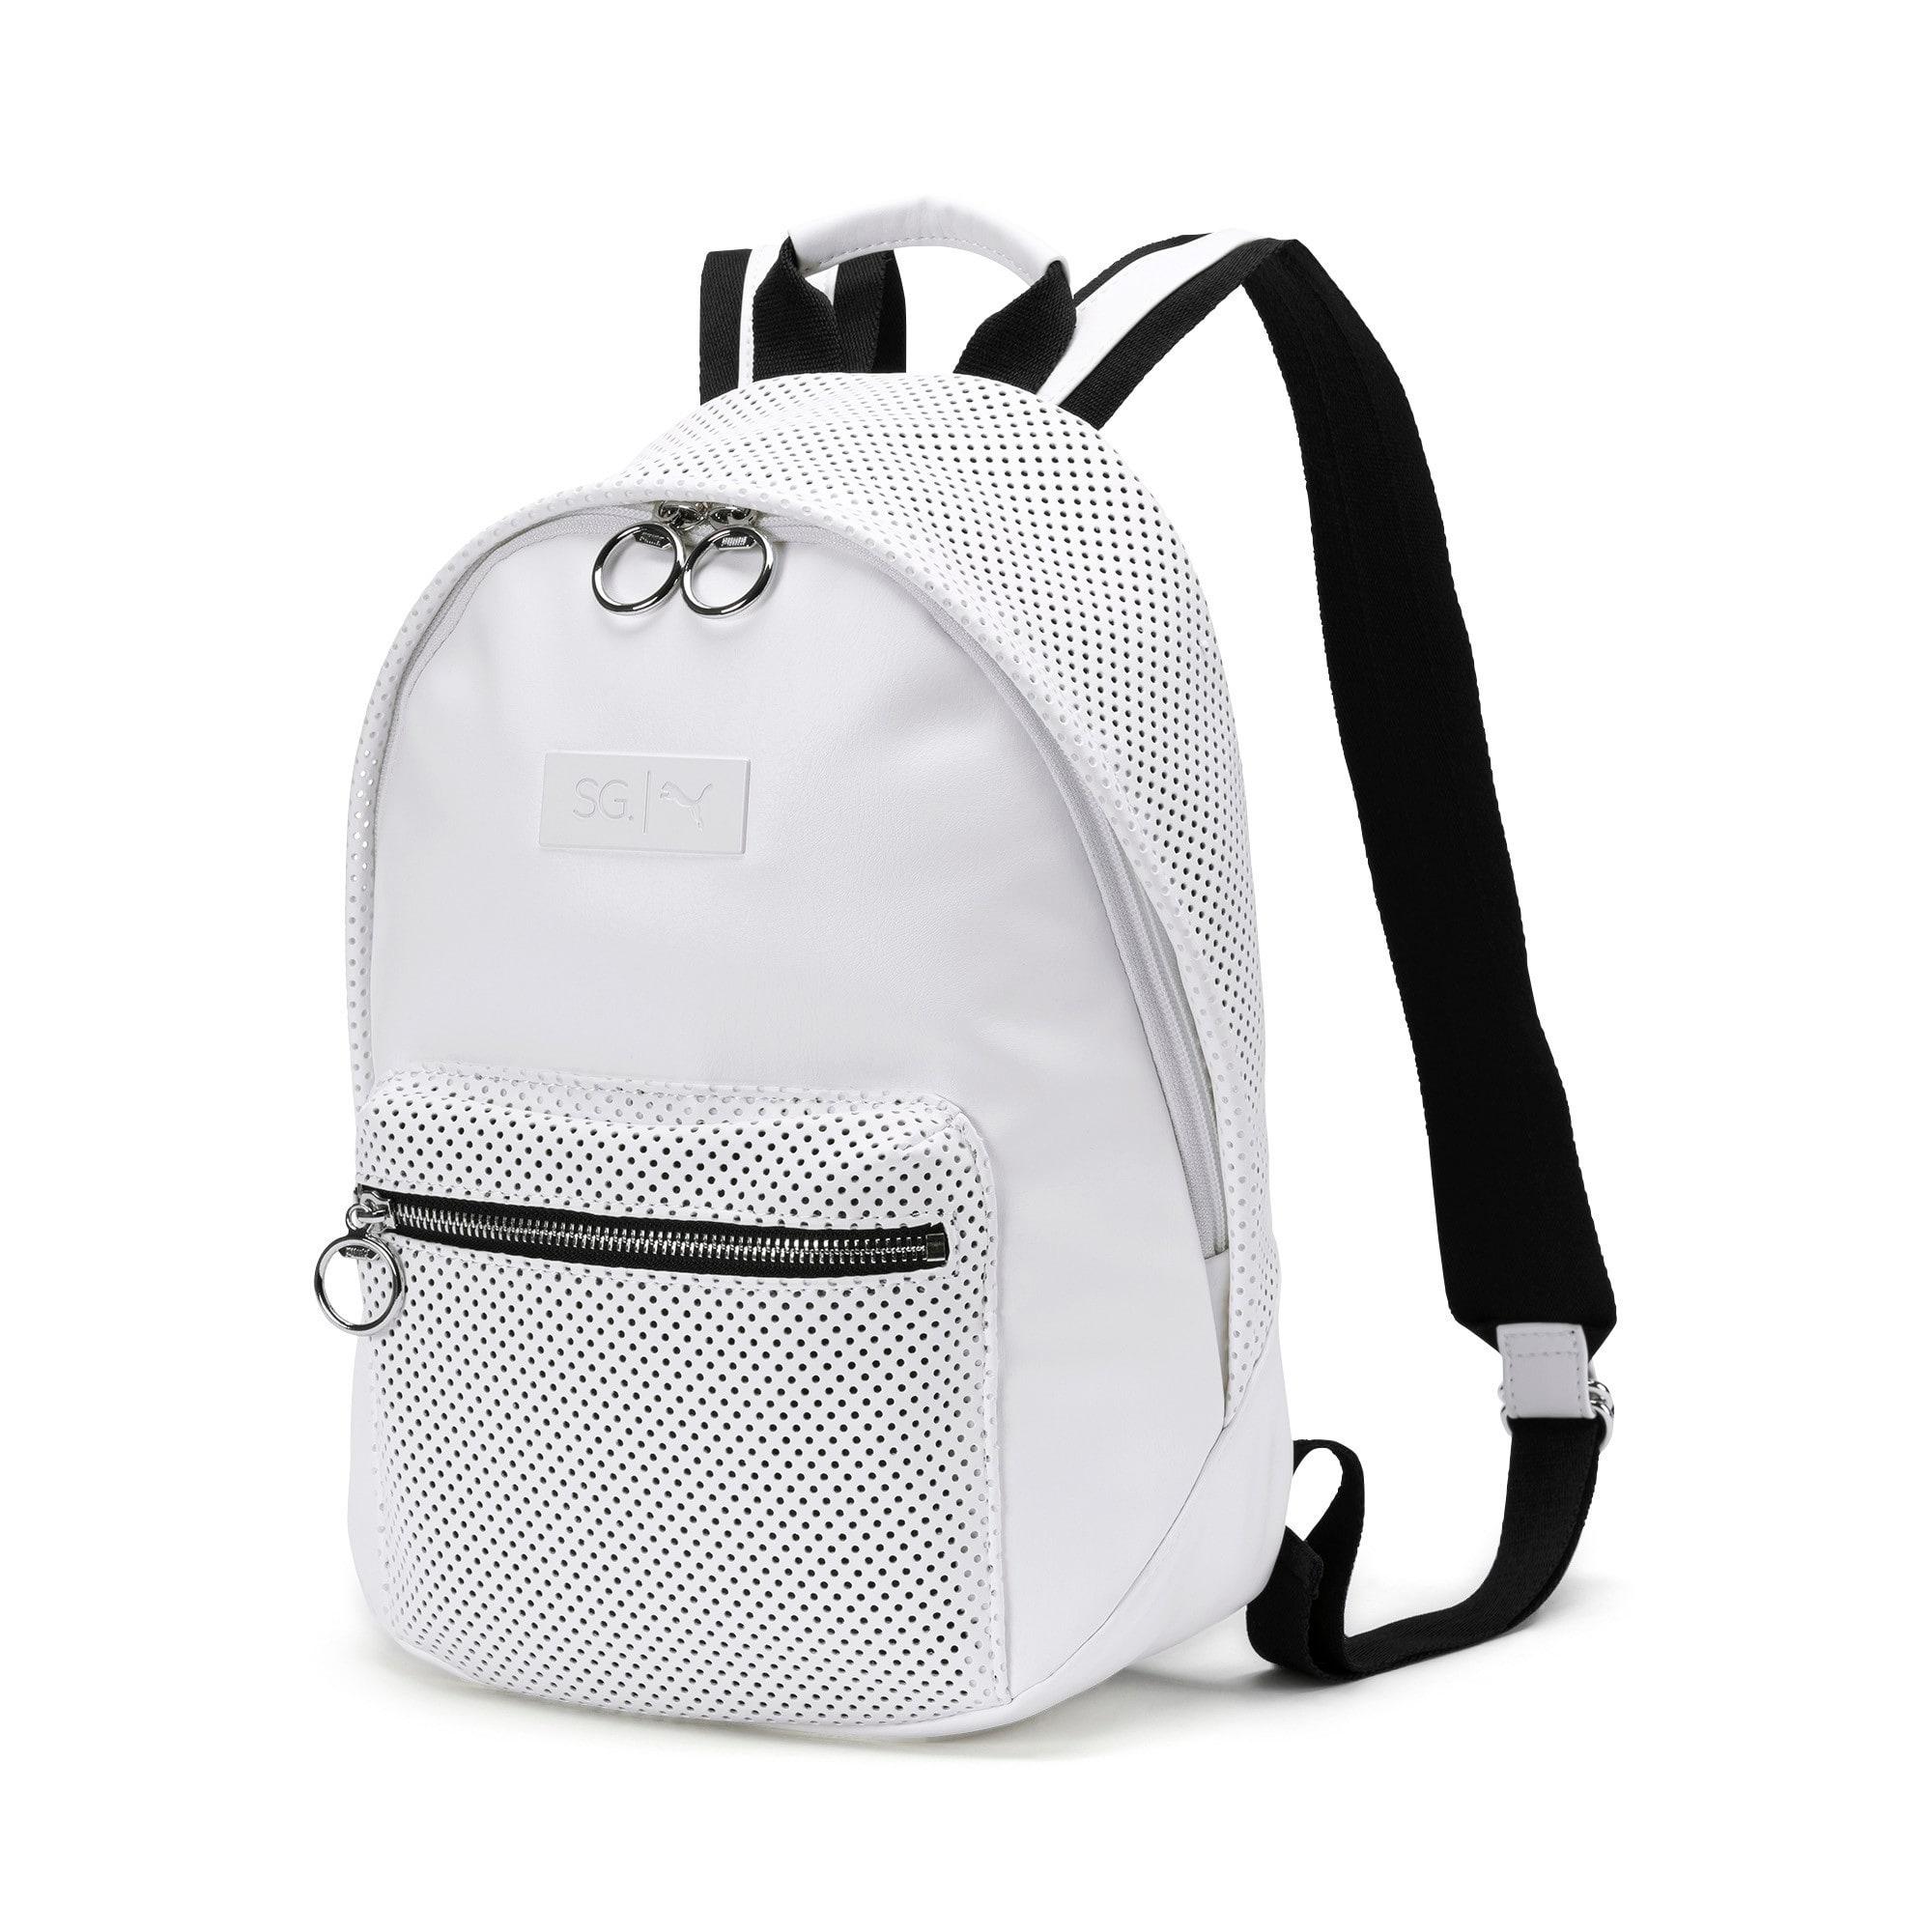 Miniatura 1 de Mochila SG x PUMA Style, Puma White, mediano